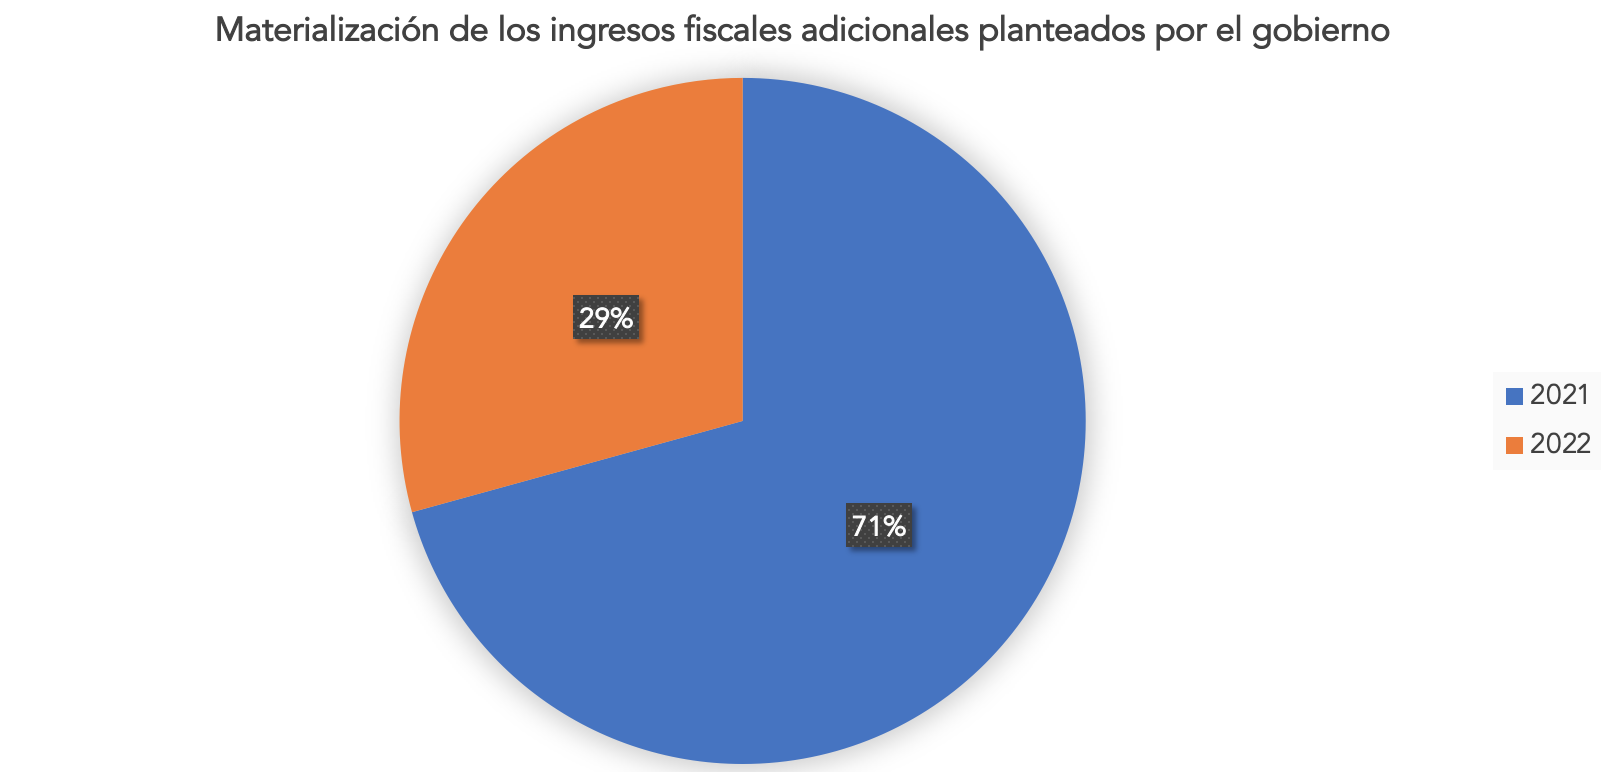 1-materializacion-subidas-fiscales-pedro-sanchez-2021-2022.png